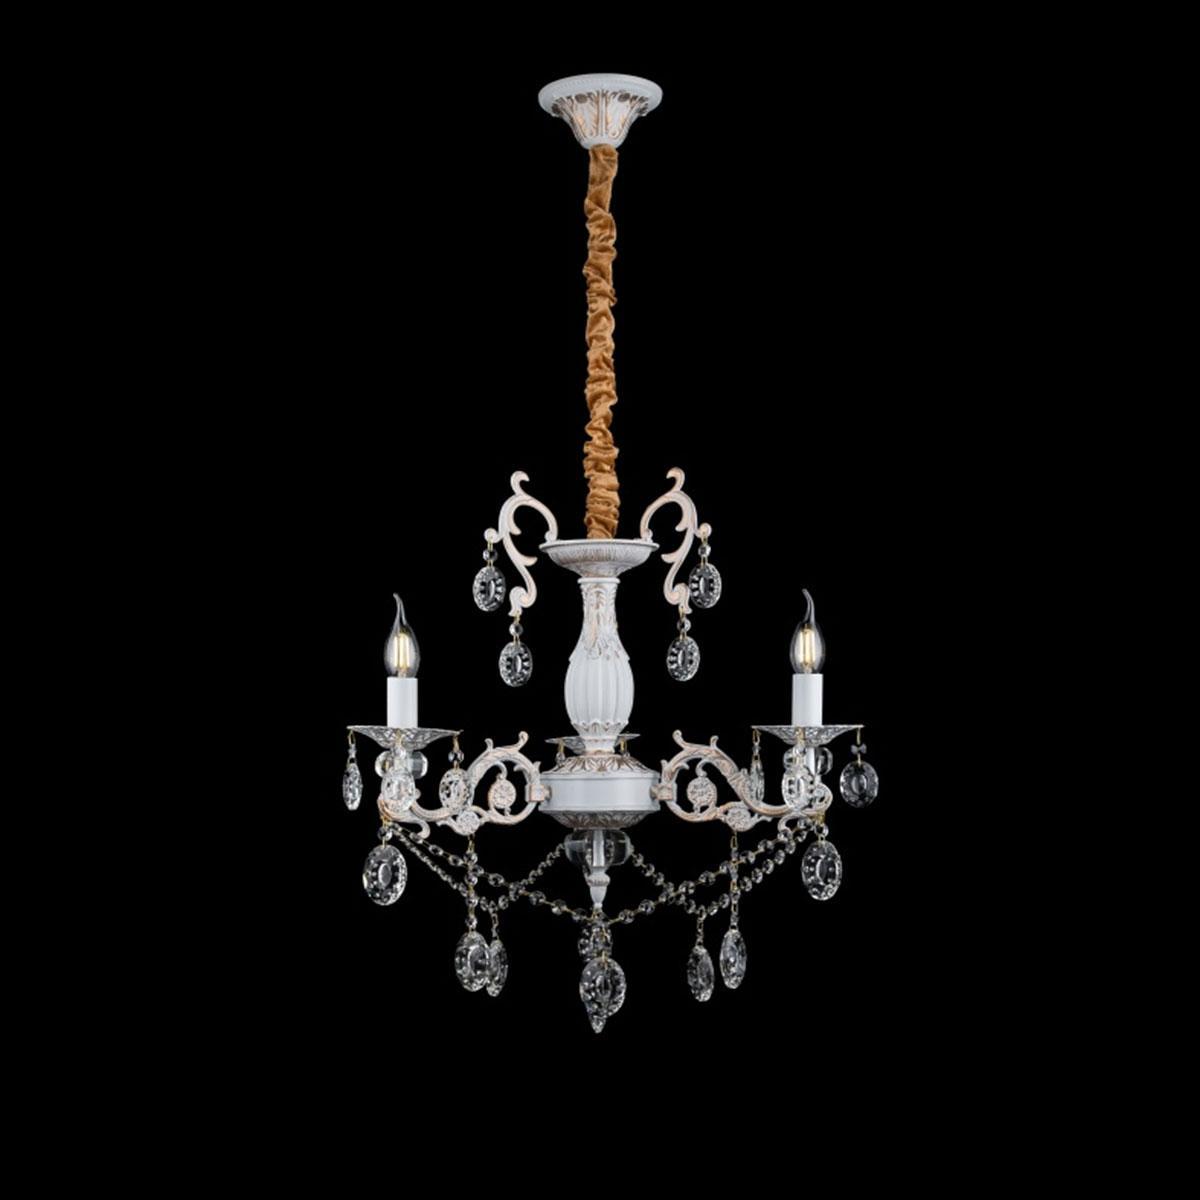 Классическая люстра-свеча на 3 лампочки СветМира золотая патина VL-L77221/3 (WT+GD)